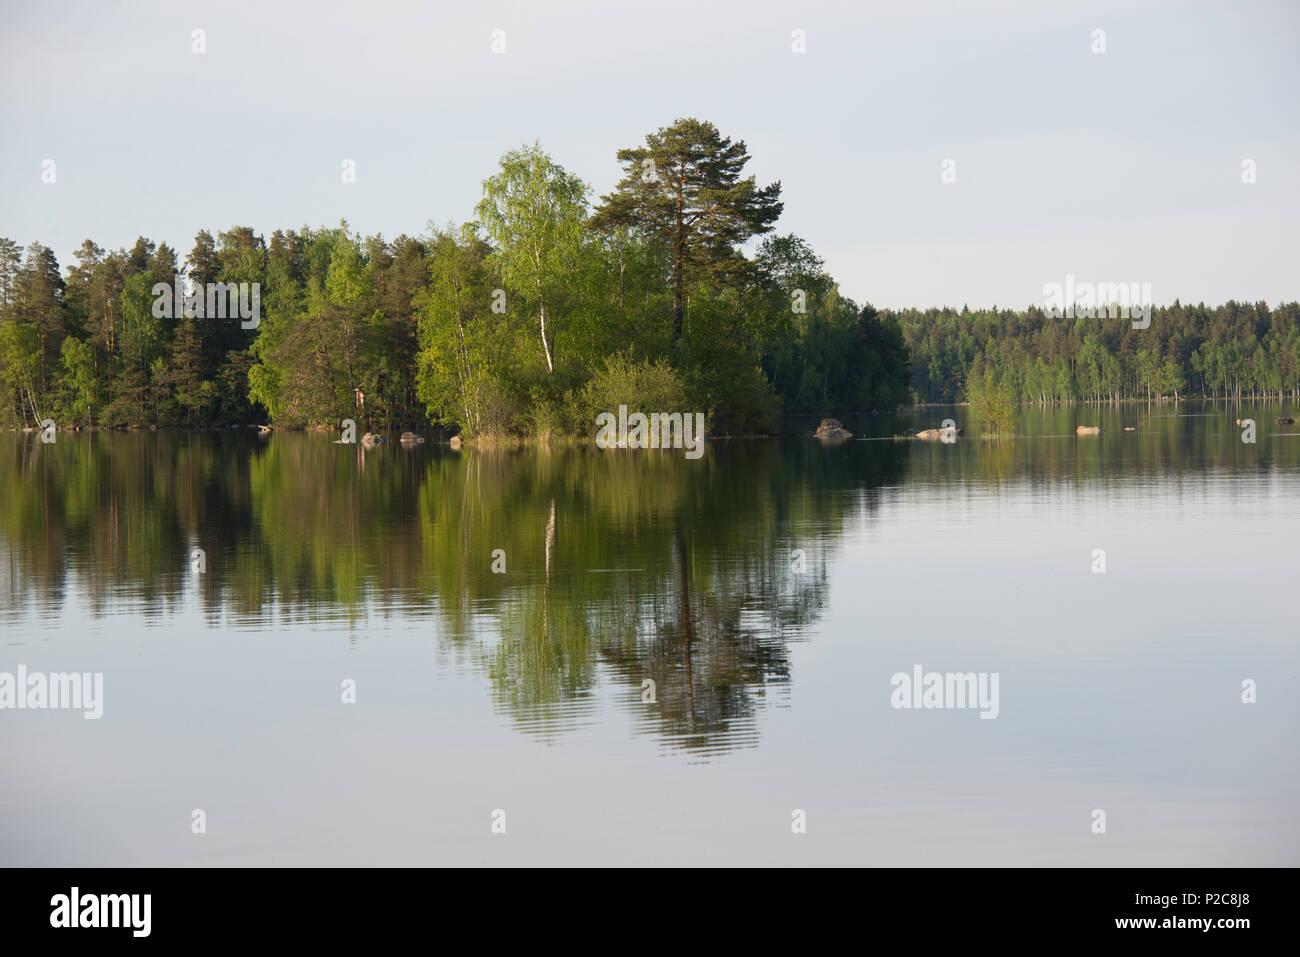 Lake Kukkia water reflections. Lake Kukkia, Luopioinen, Finland. 24.5.2018 - Stock Image